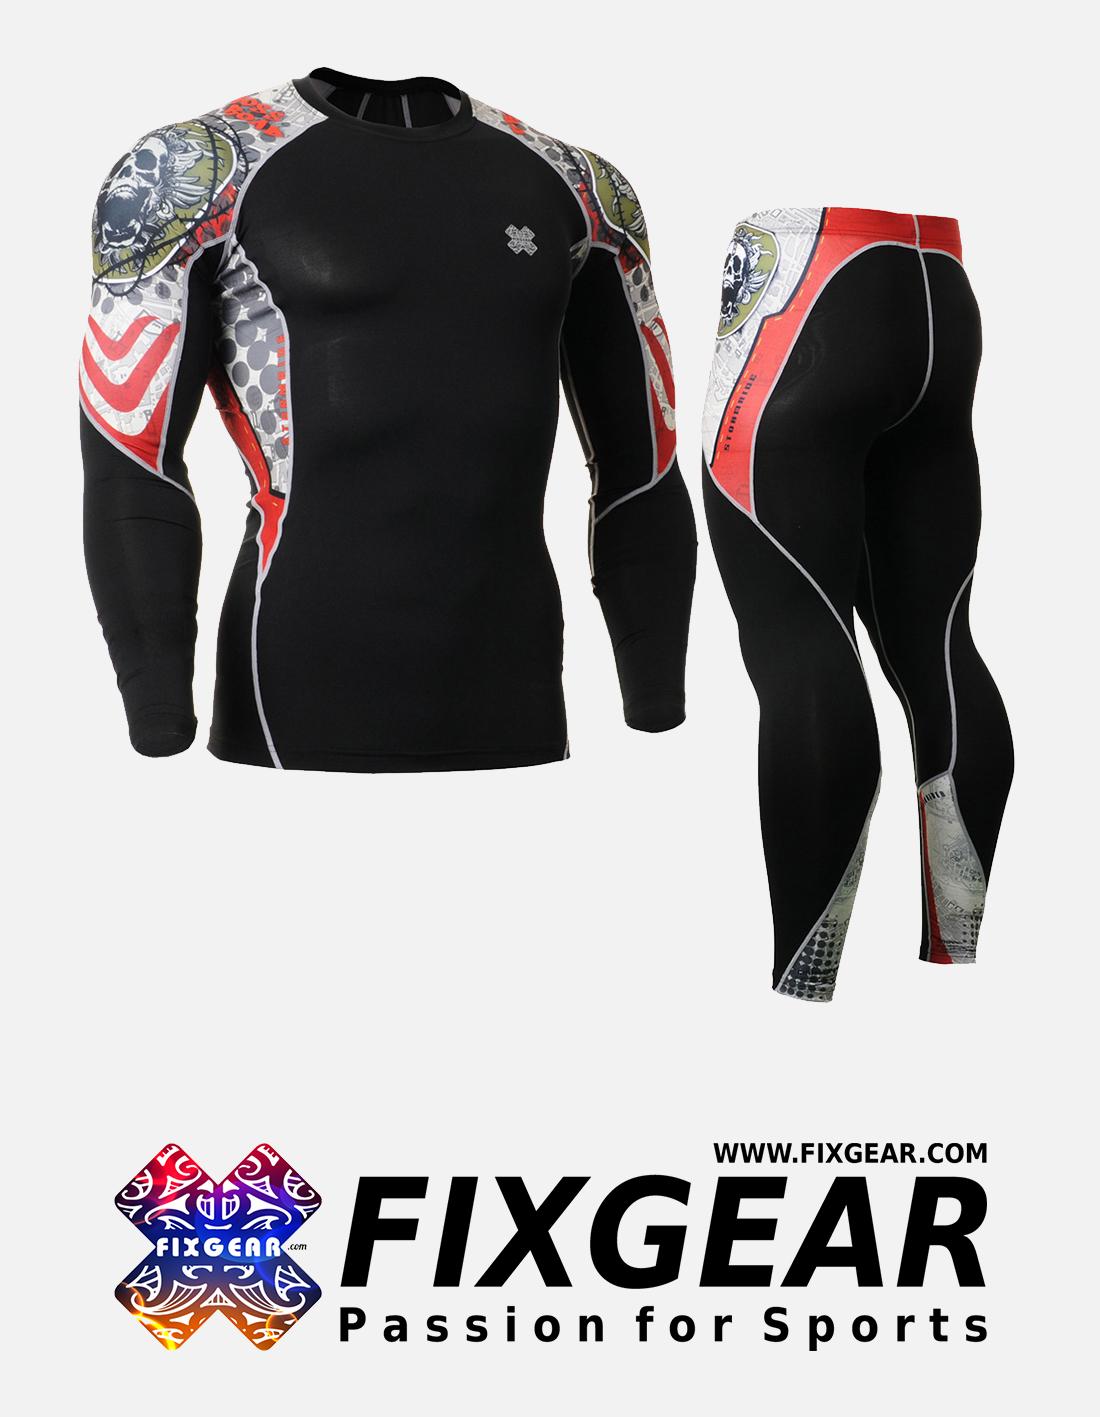 FIXGEAR C2L-P2L-B5 Set Compression Base Layer Shirt & Legging Pants